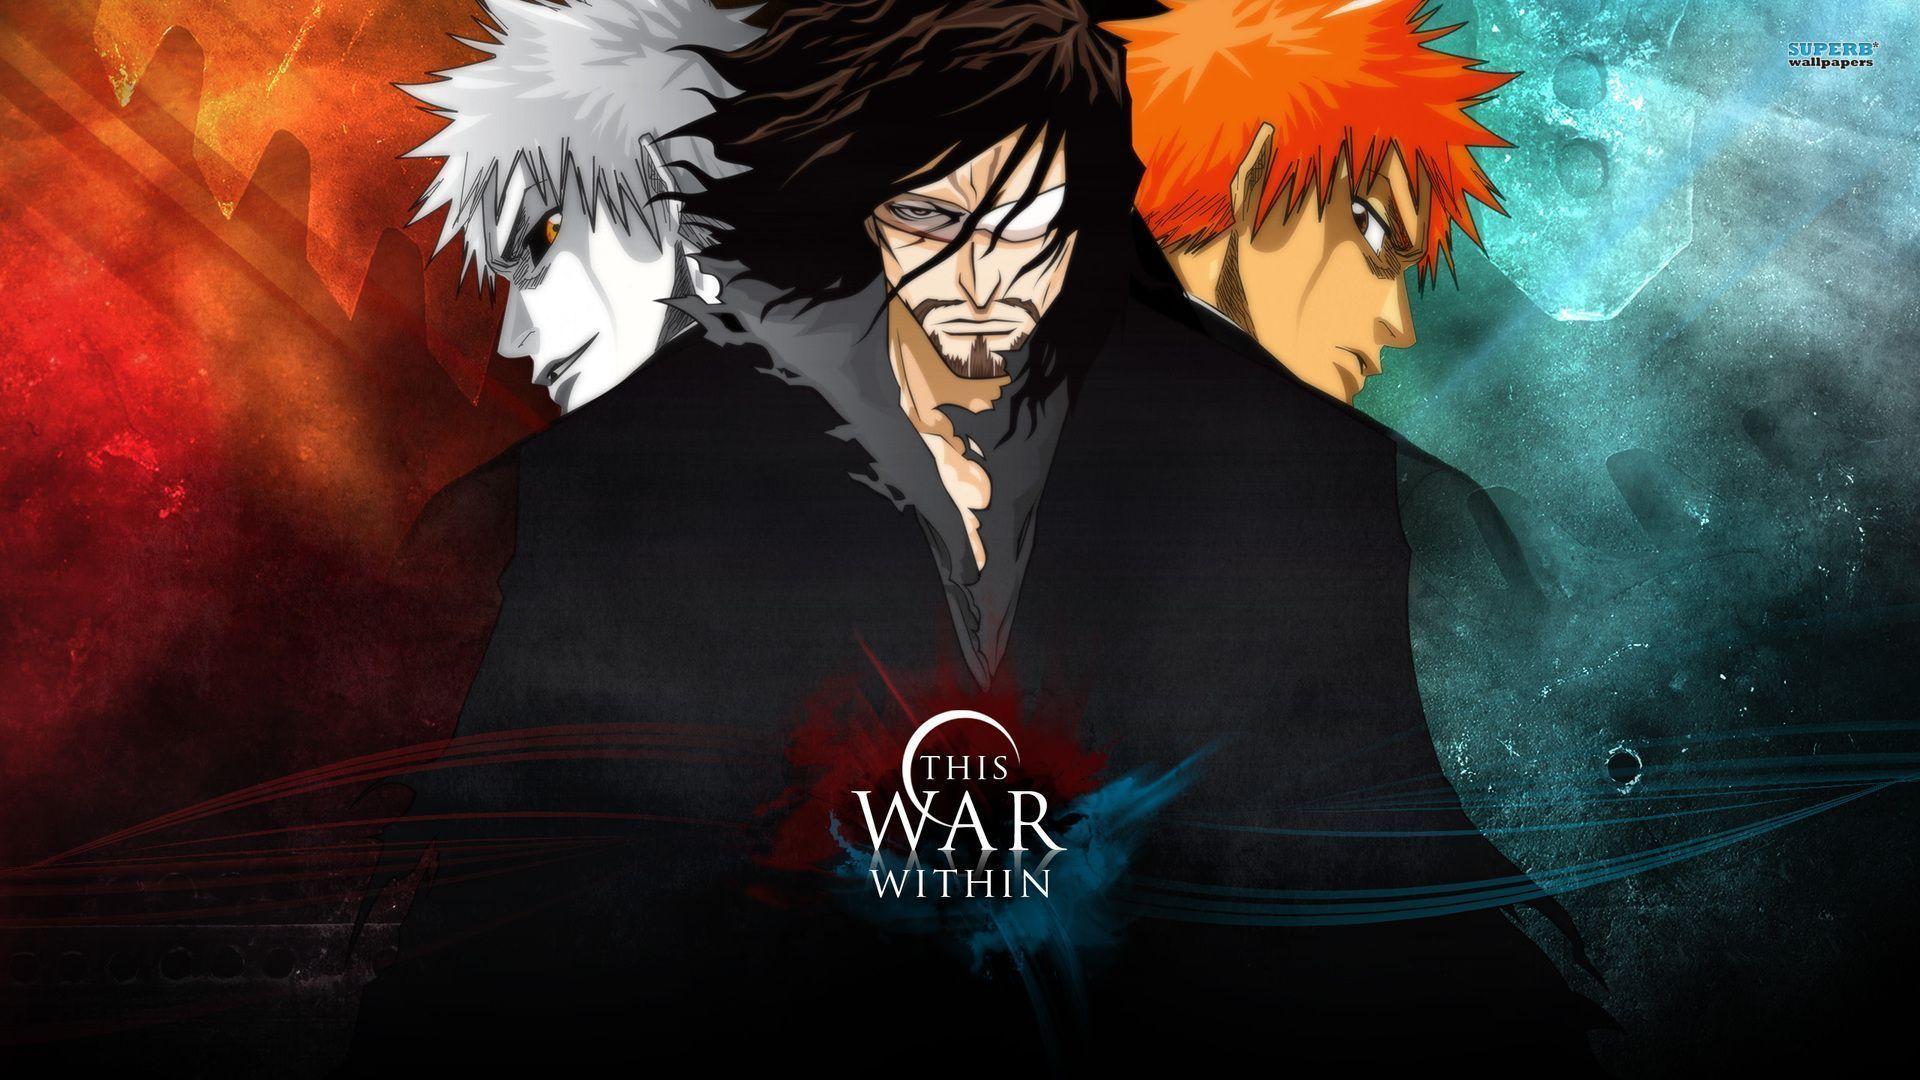 Best Anime Bleach Ichigo Kurosaki Image Picture Gallery